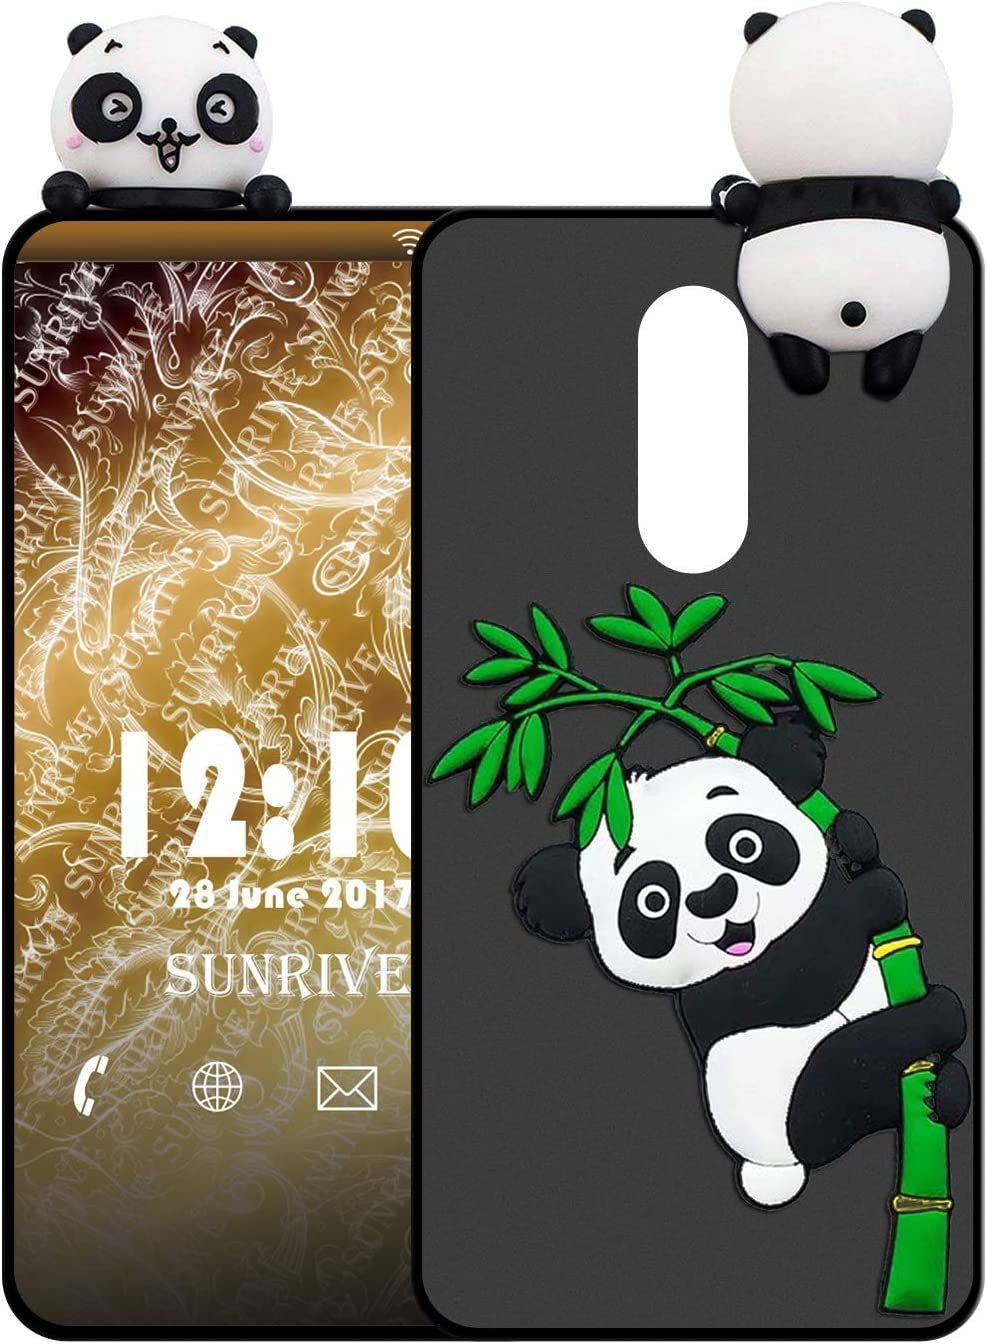 Sunrive Funda para ZTE Axon 7 Mini, Silicona Mate Funda Slim Fit Gel 3D Carcasa Case Bumper de Impactos y Anti-Arañazos Espalda Cover(W1 Panda 2) + 1 x Lápiz óptico